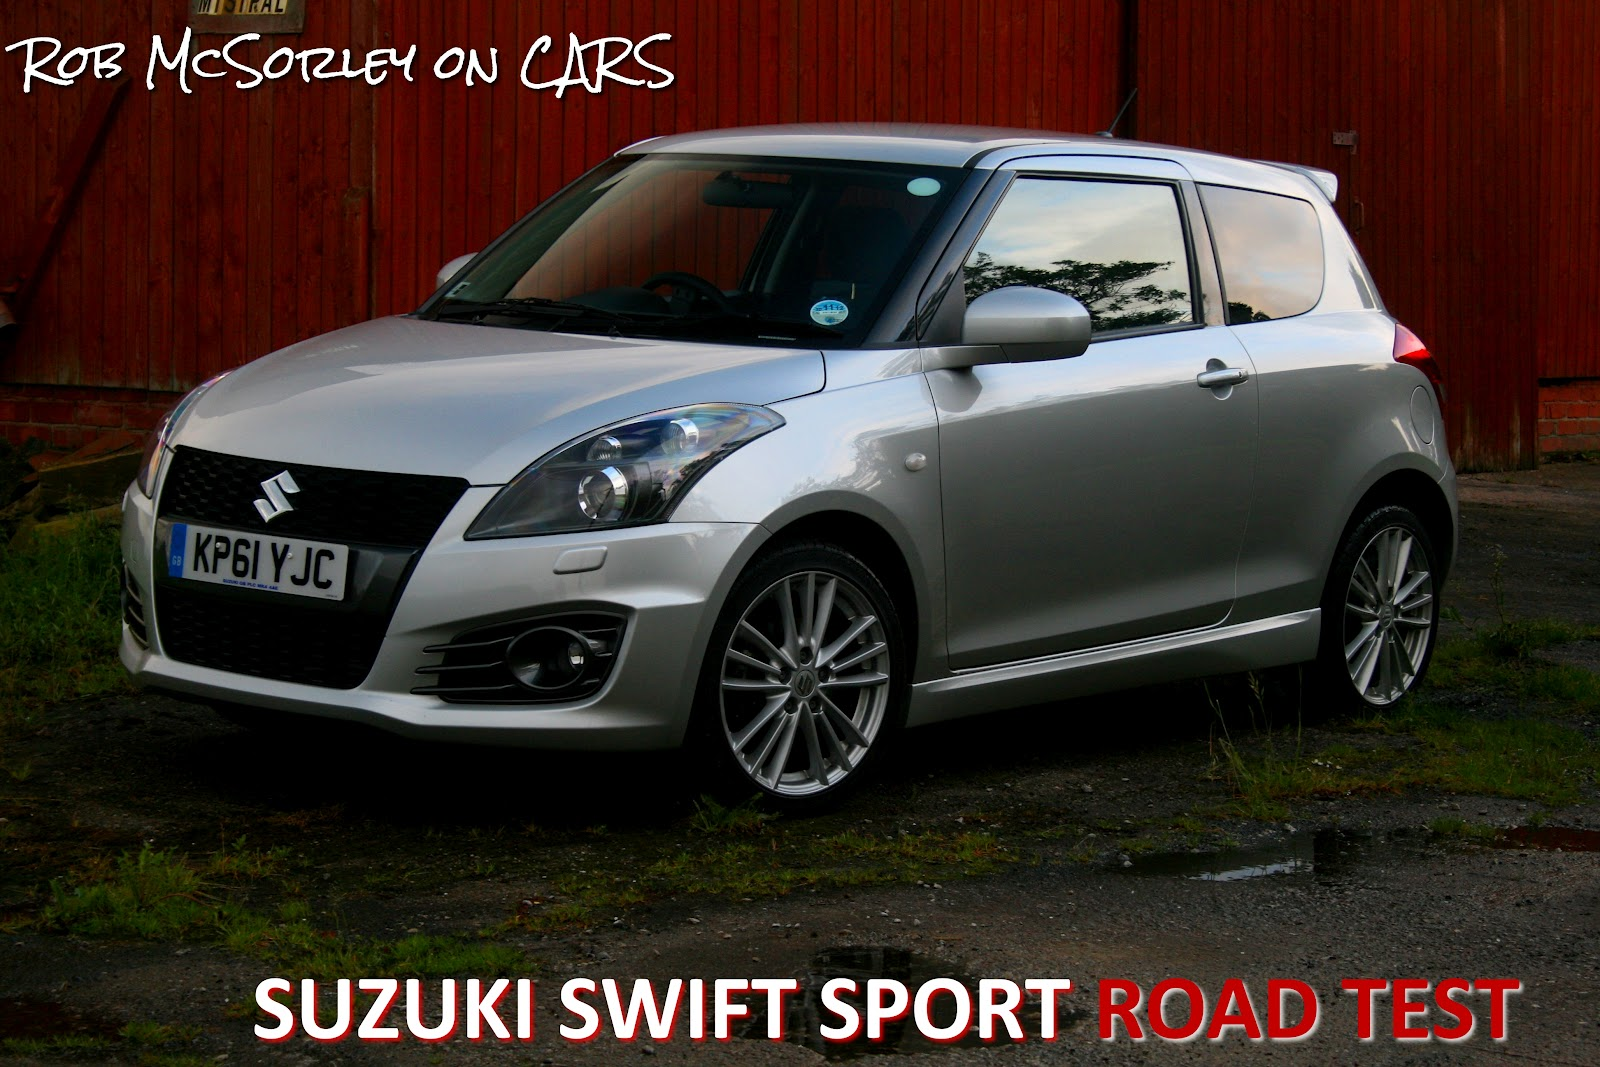 robmcsorleyoncars 2012 suzuki swift sport full road test. Black Bedroom Furniture Sets. Home Design Ideas